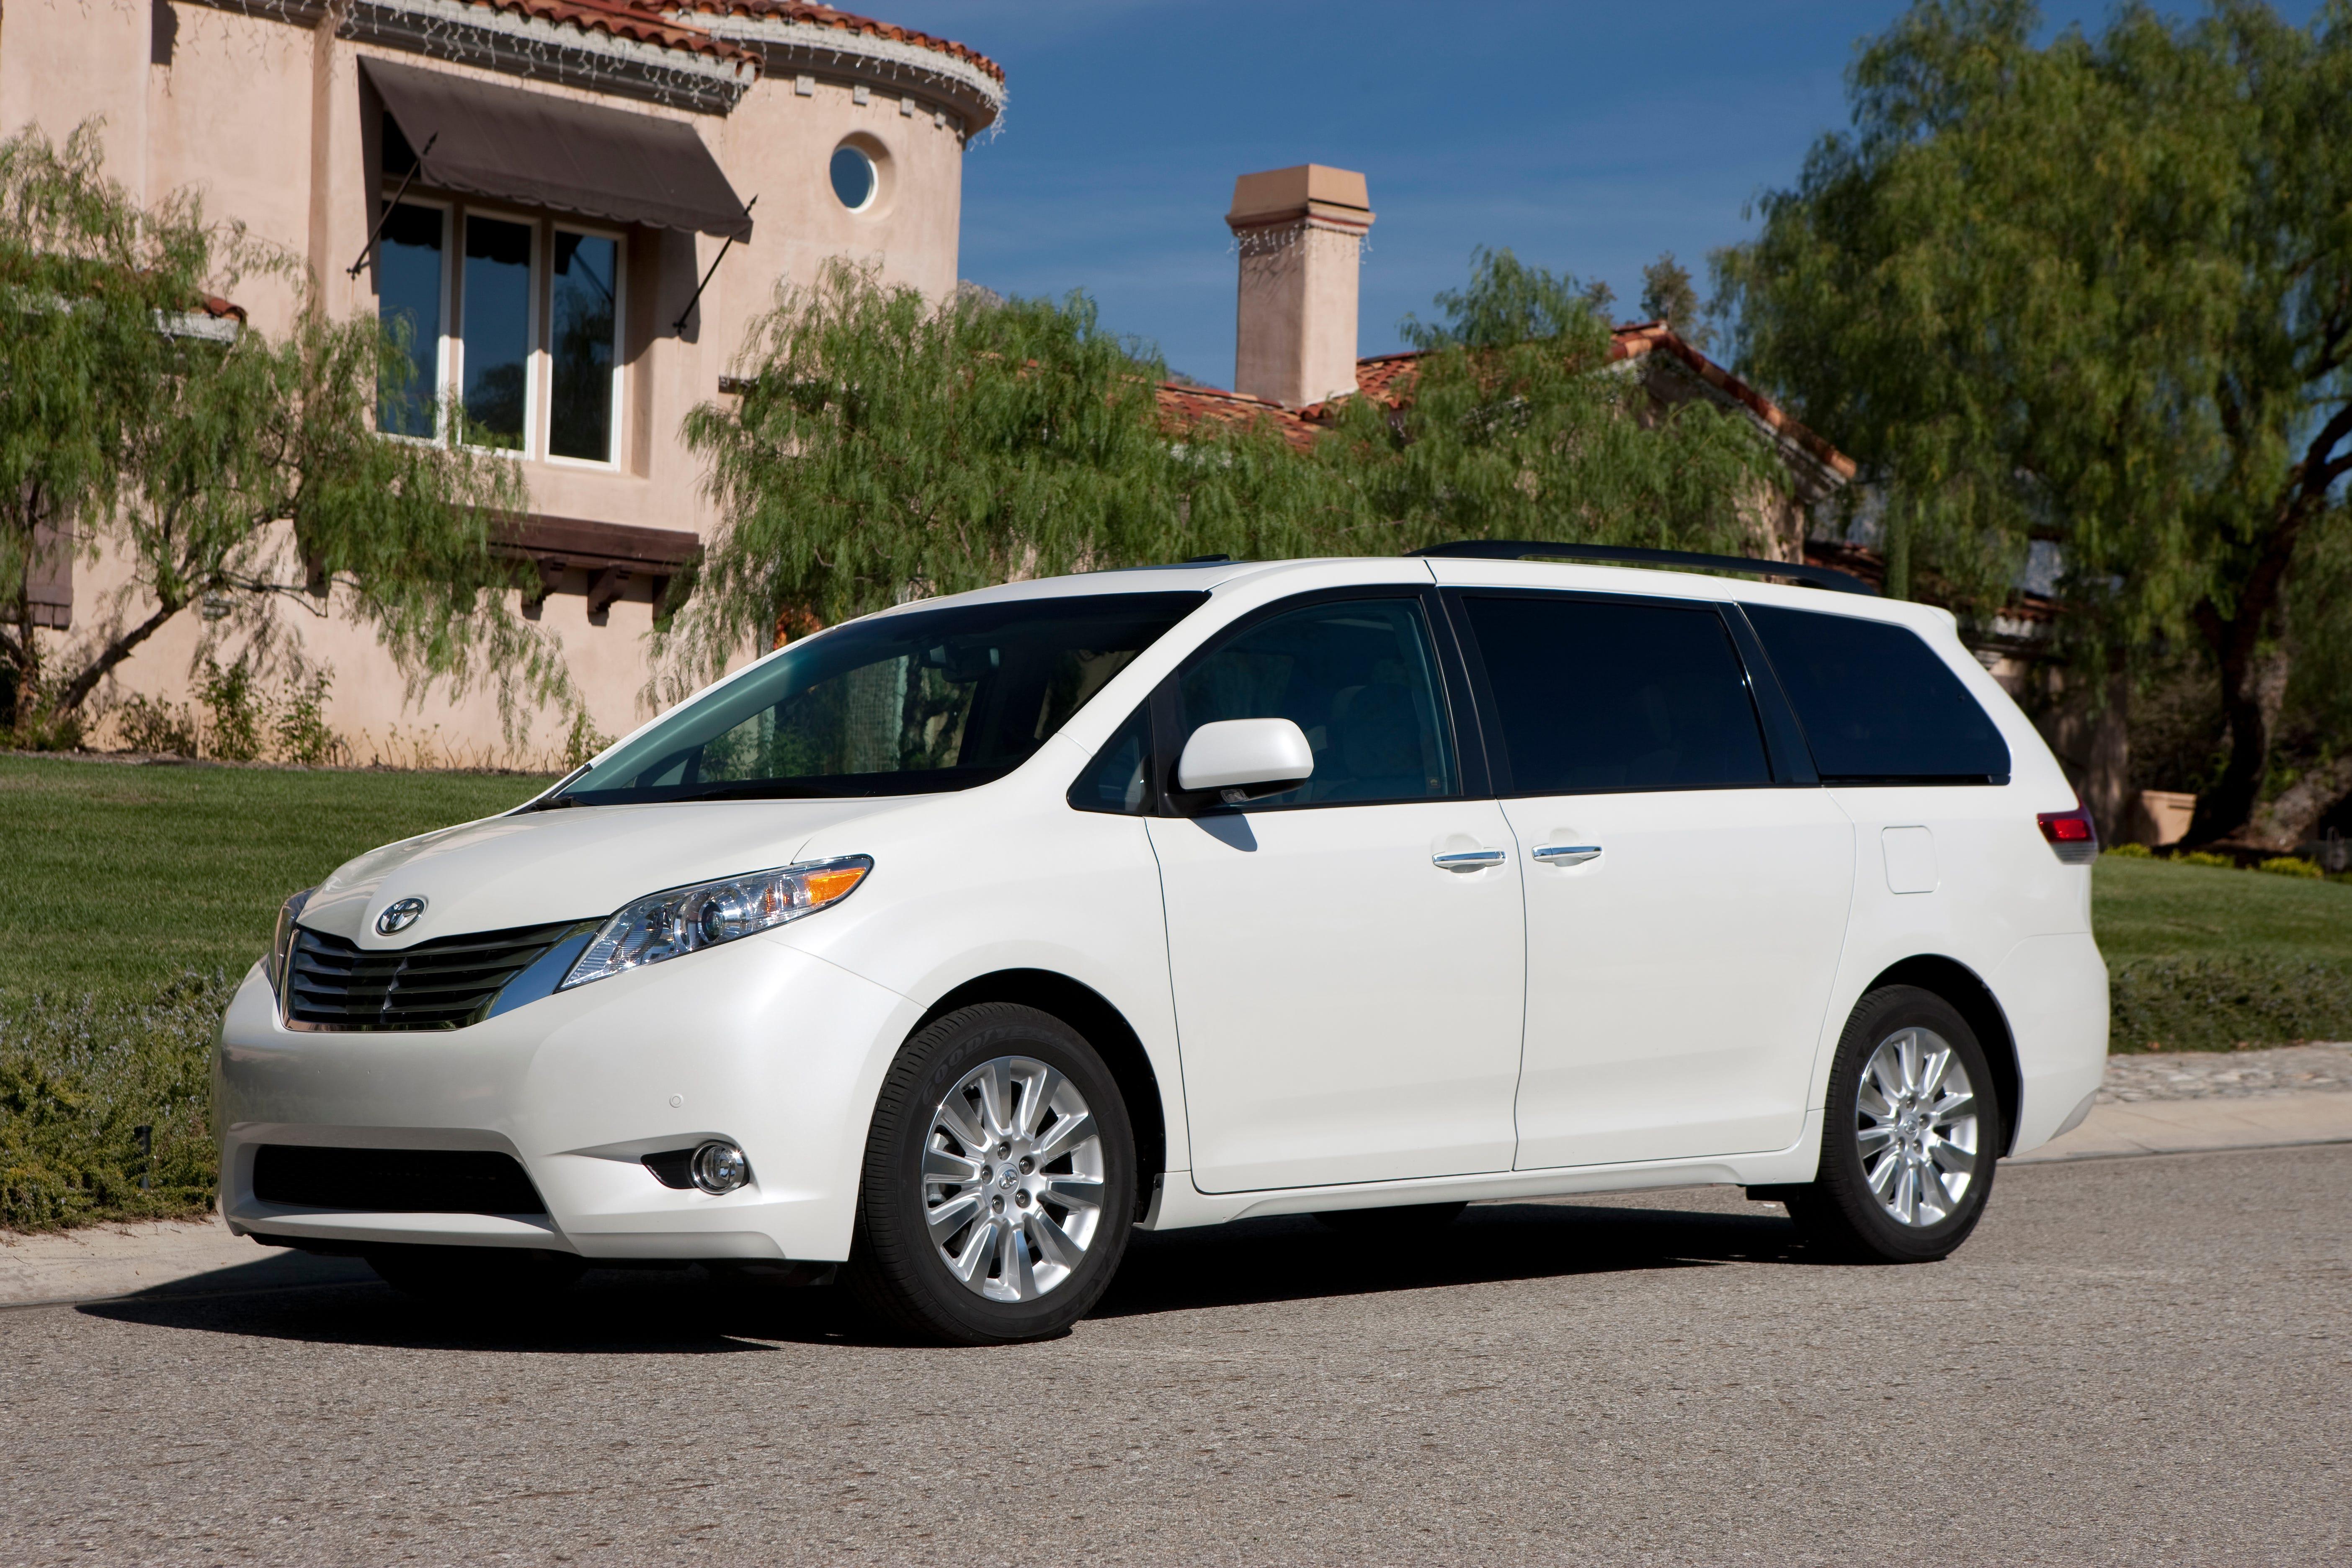 Toyota Sienna Service Manual: Registration